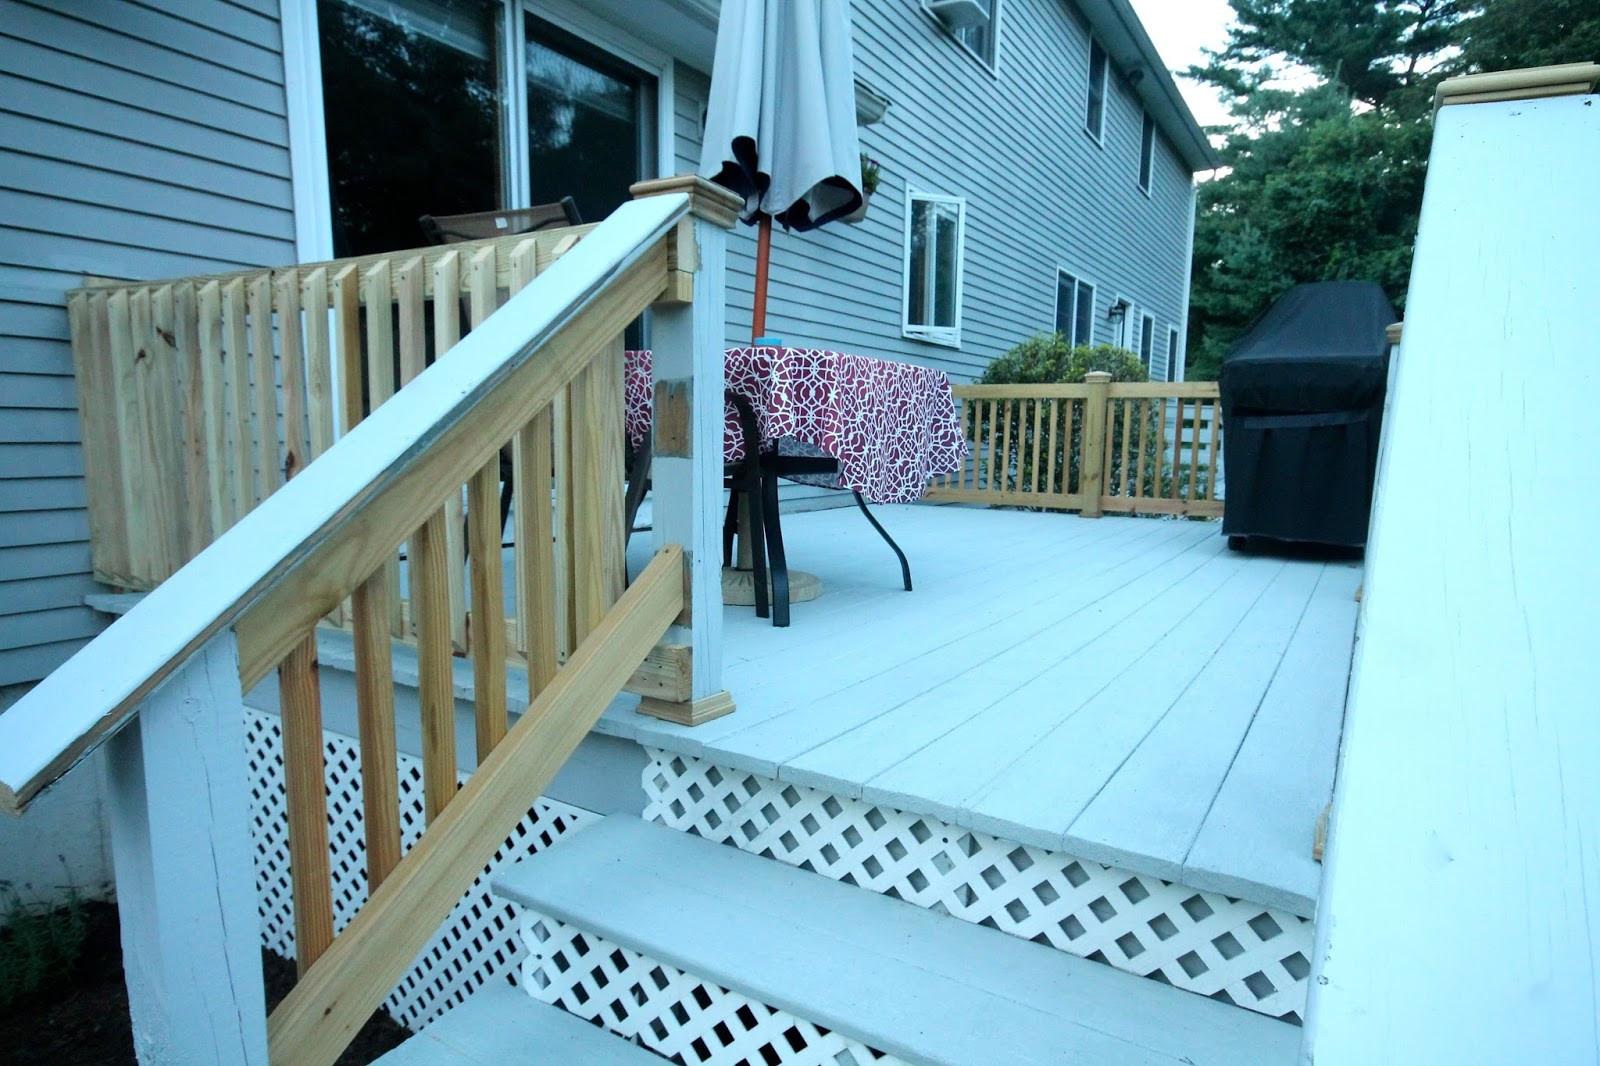 Lowes Deck Paint Restore  Rustoleum Deck Restore Project and Review